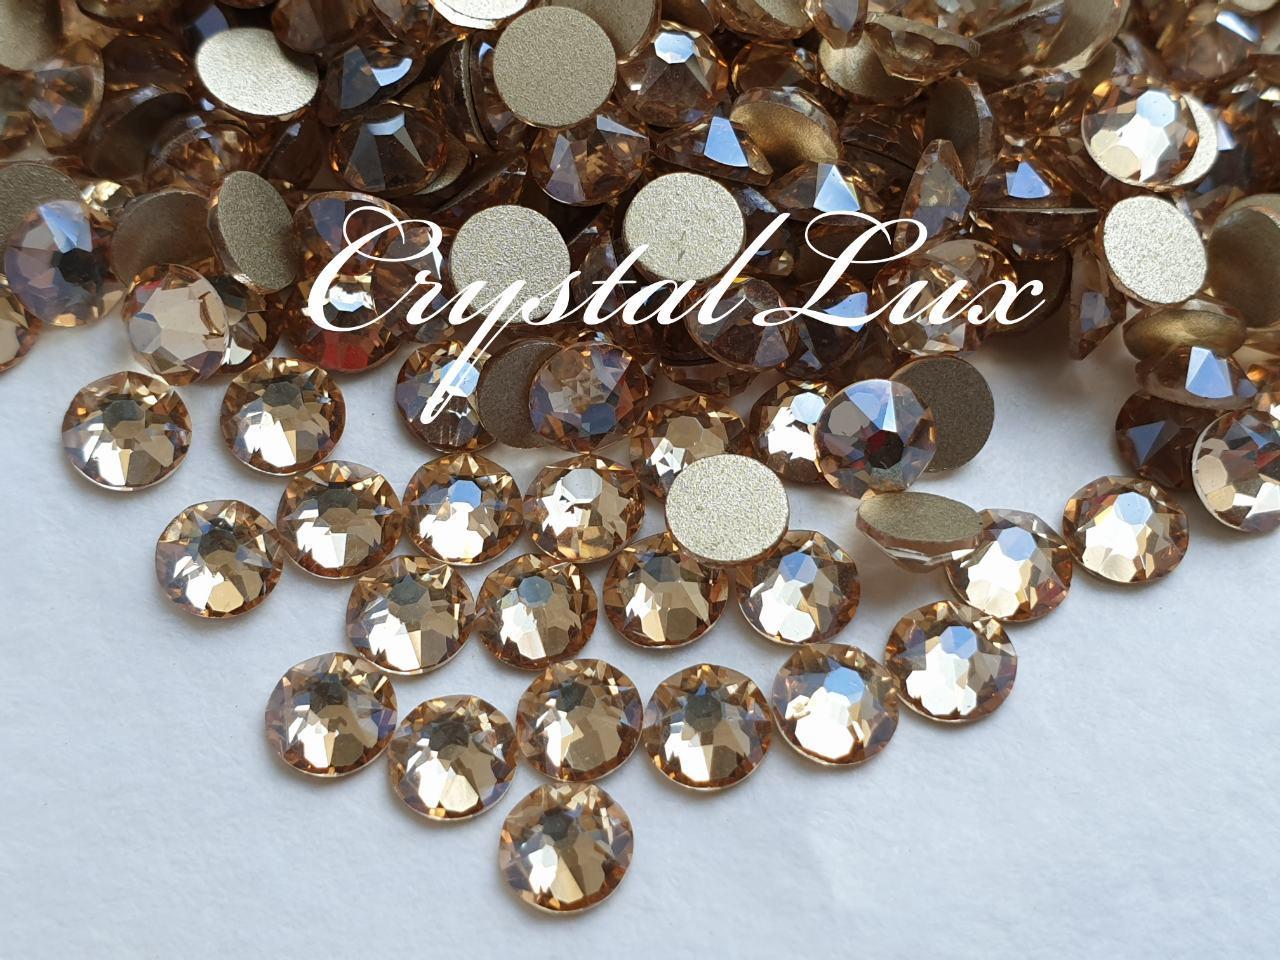 Стразы ss16 Gold Shaddow Xirius, NEW, 16 граней, 1440шт. (4,0мм)